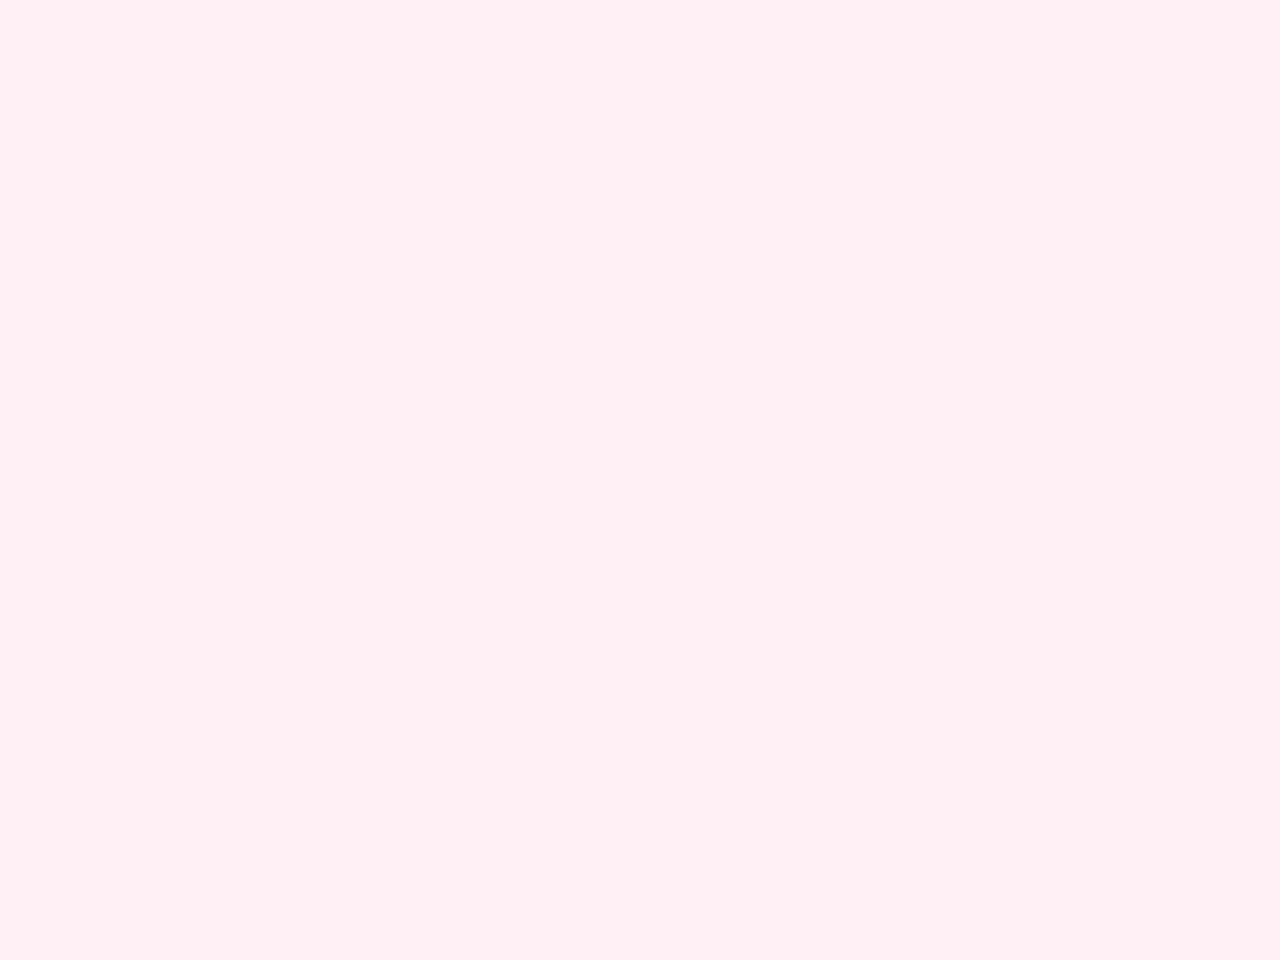 1280x960 Lavender Blush Solid Color Background